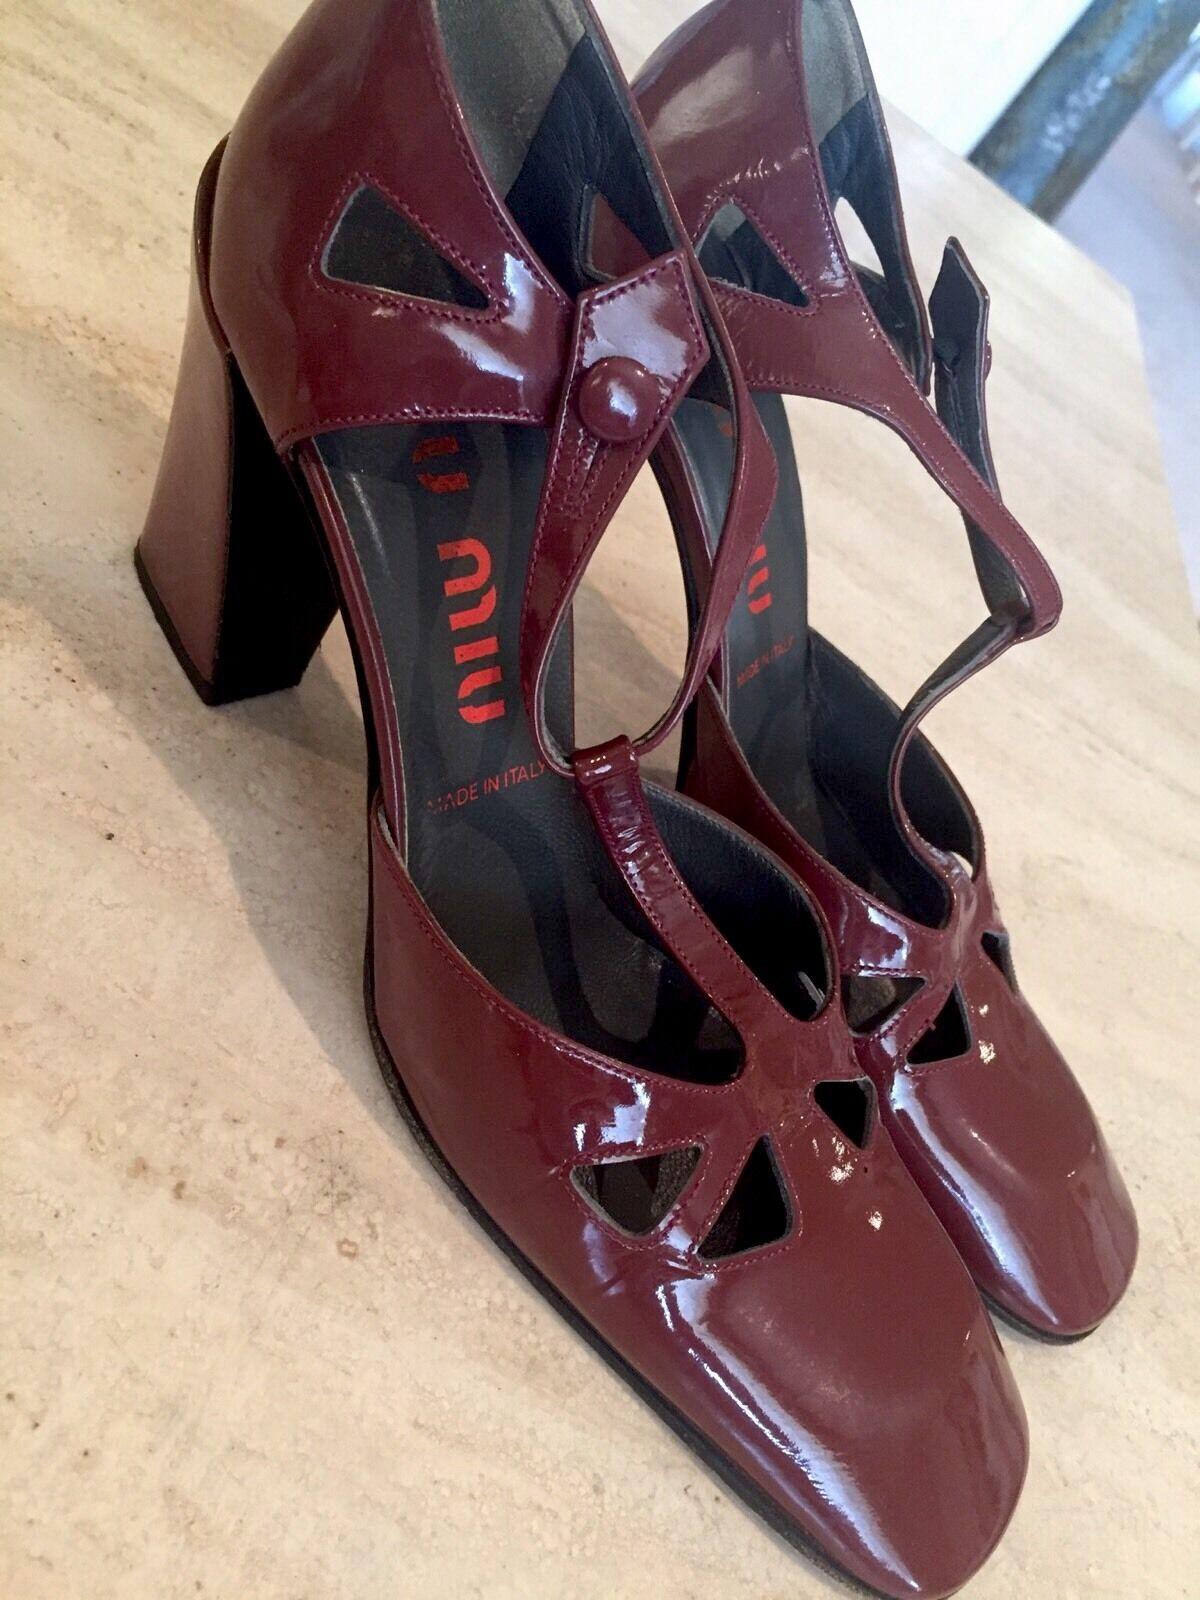 Miu Miu damen braun Slingback Heel Sz 37 Euro    7-7.5 US Excellent 84911c